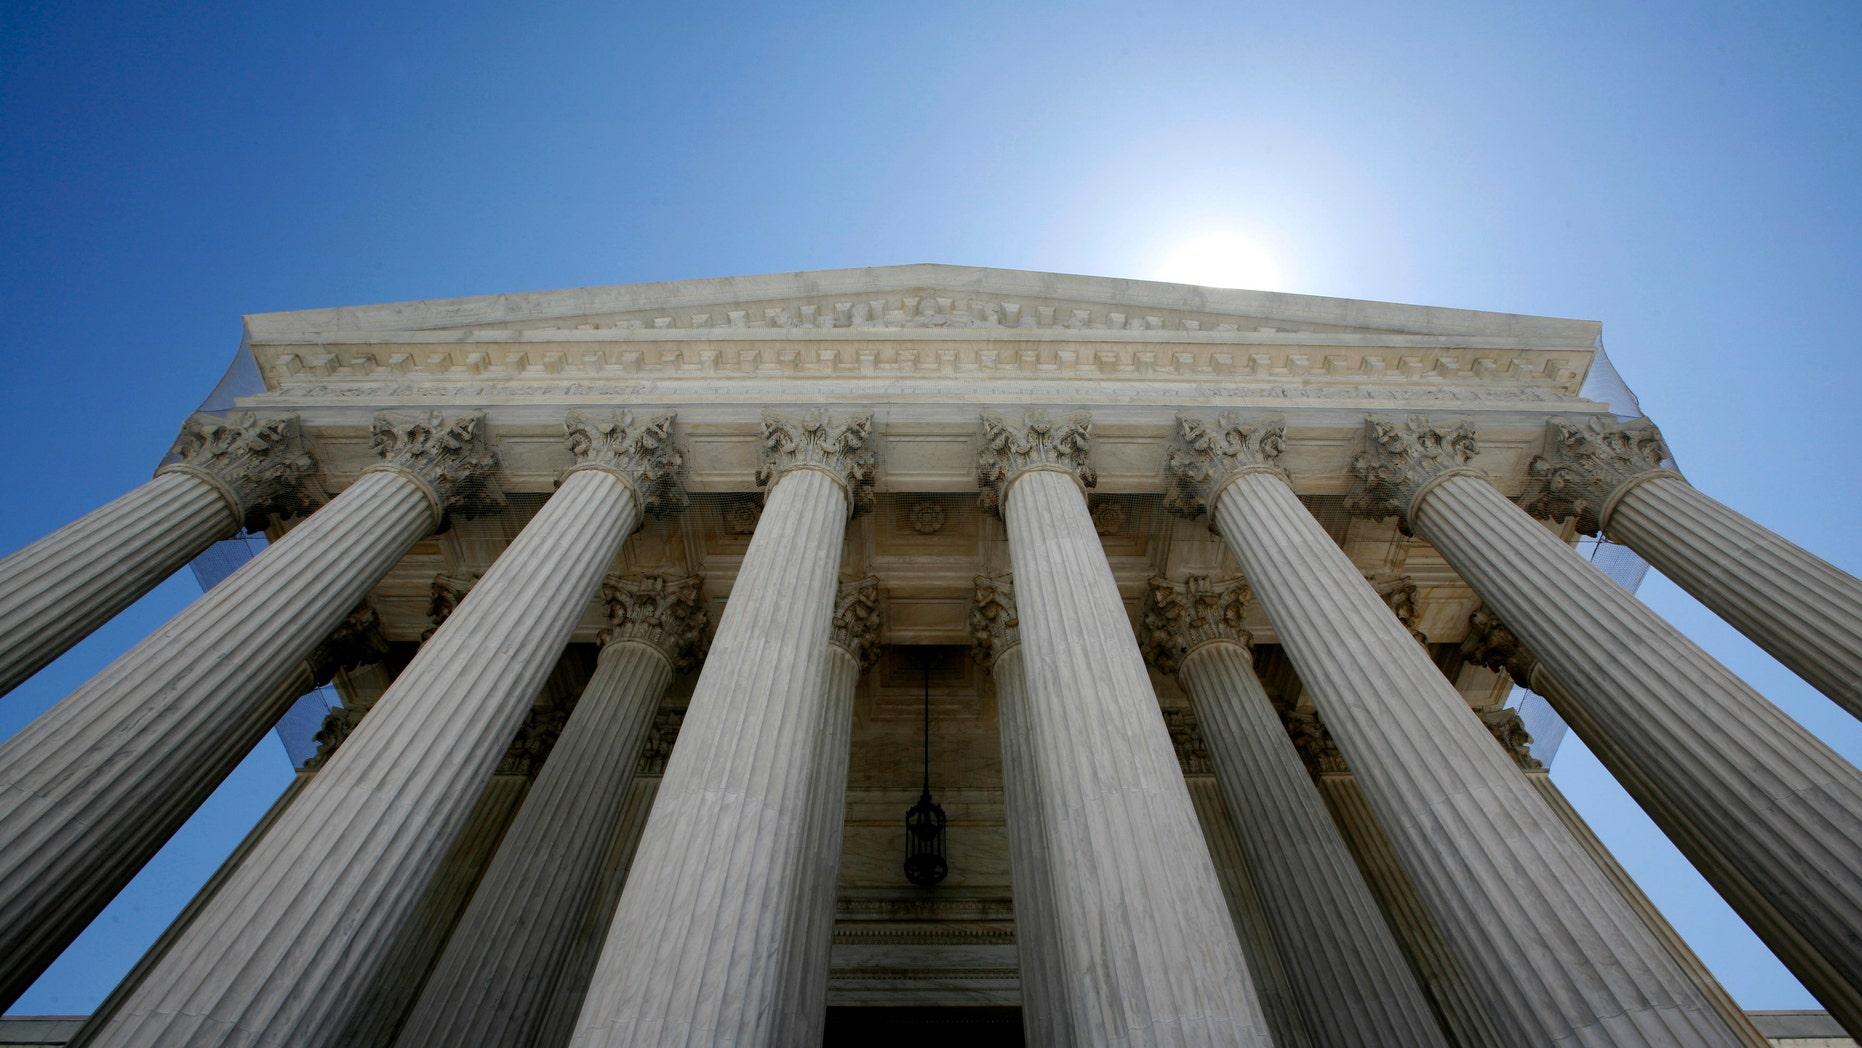 The U.S. Supreme Court building seen in Washington.